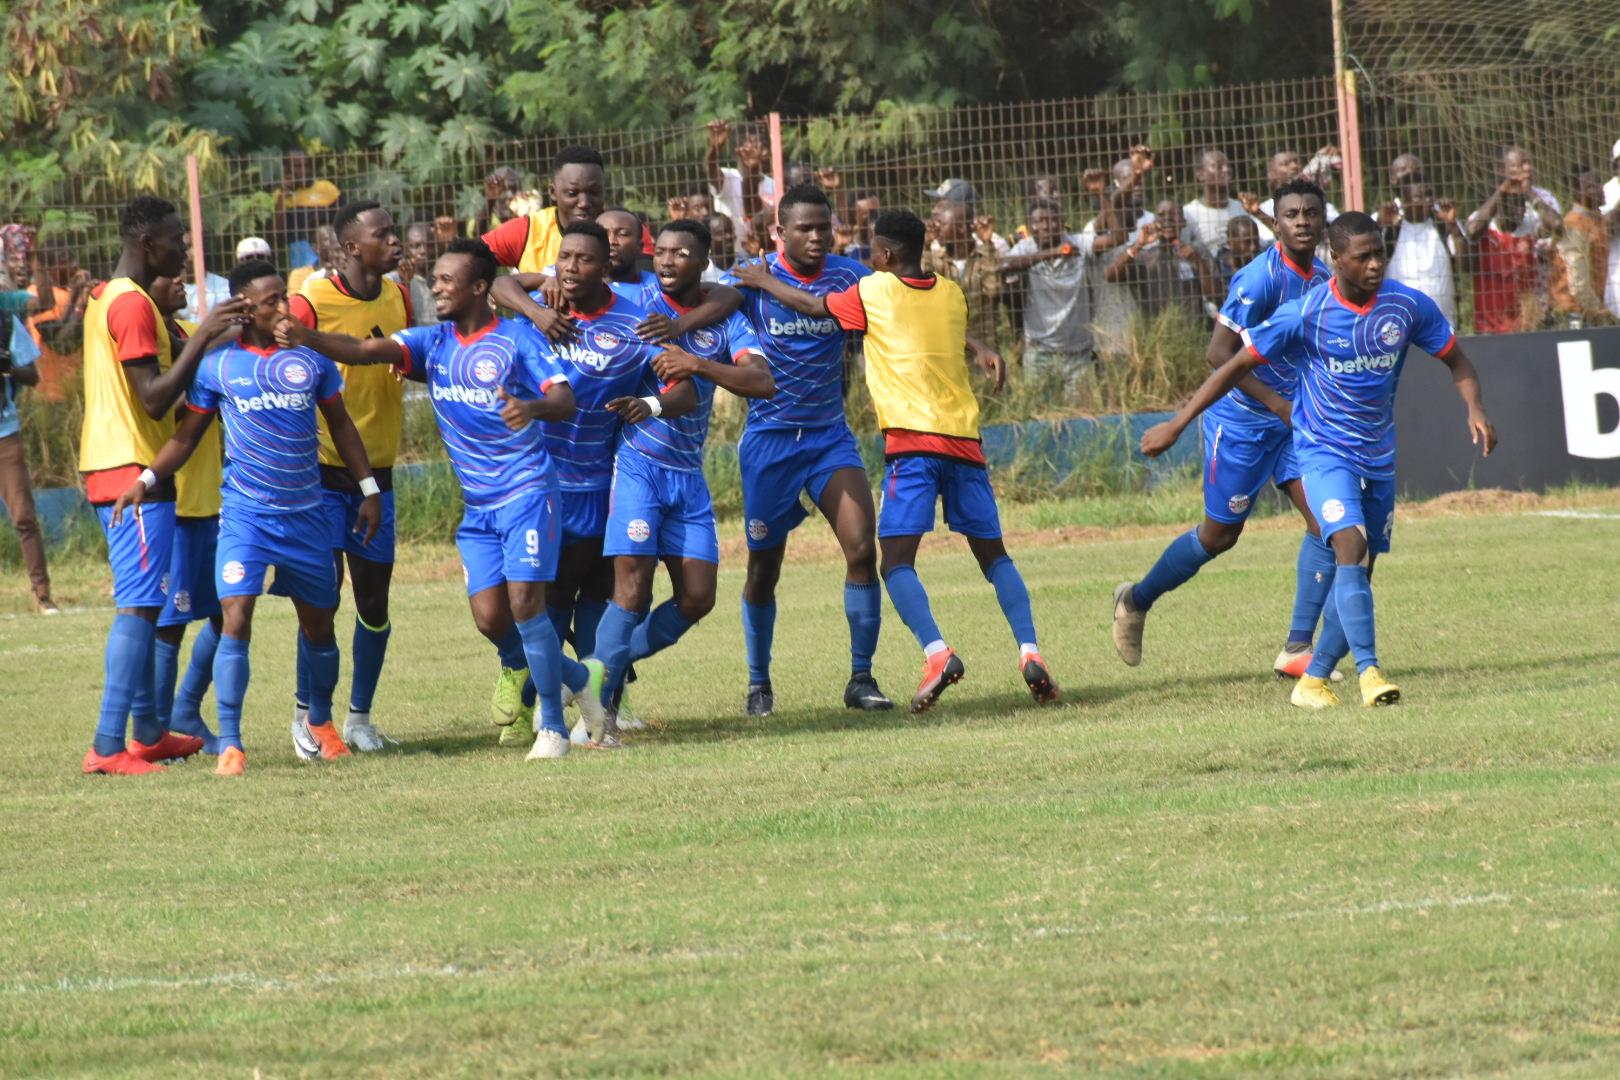 2019/2020 Ghana Premier League: Match Week 6 Report - WAFA 1-2 Liberty